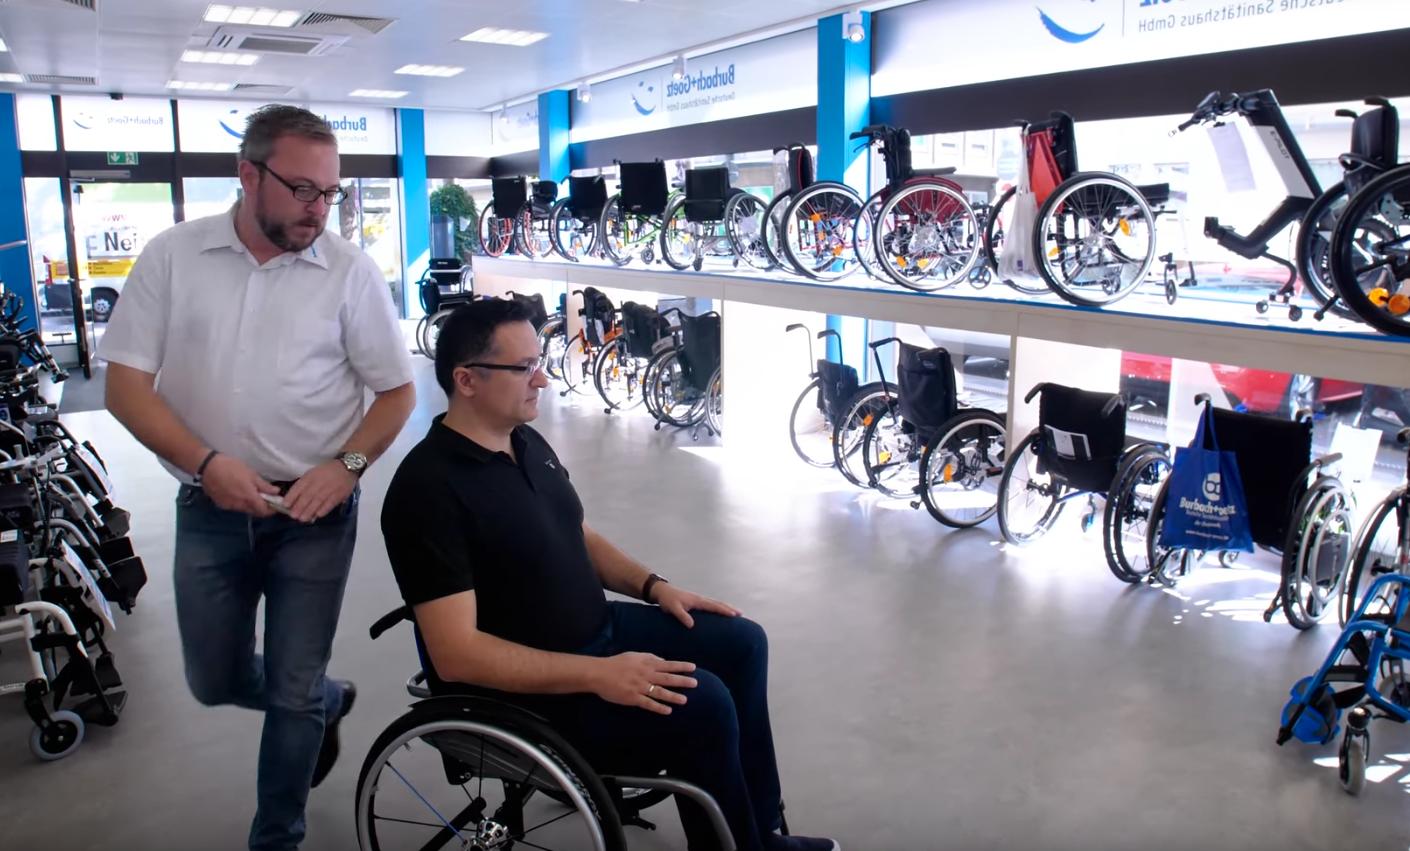 Aktivrollstuhl im Rollstuhlzentrum Koblenz